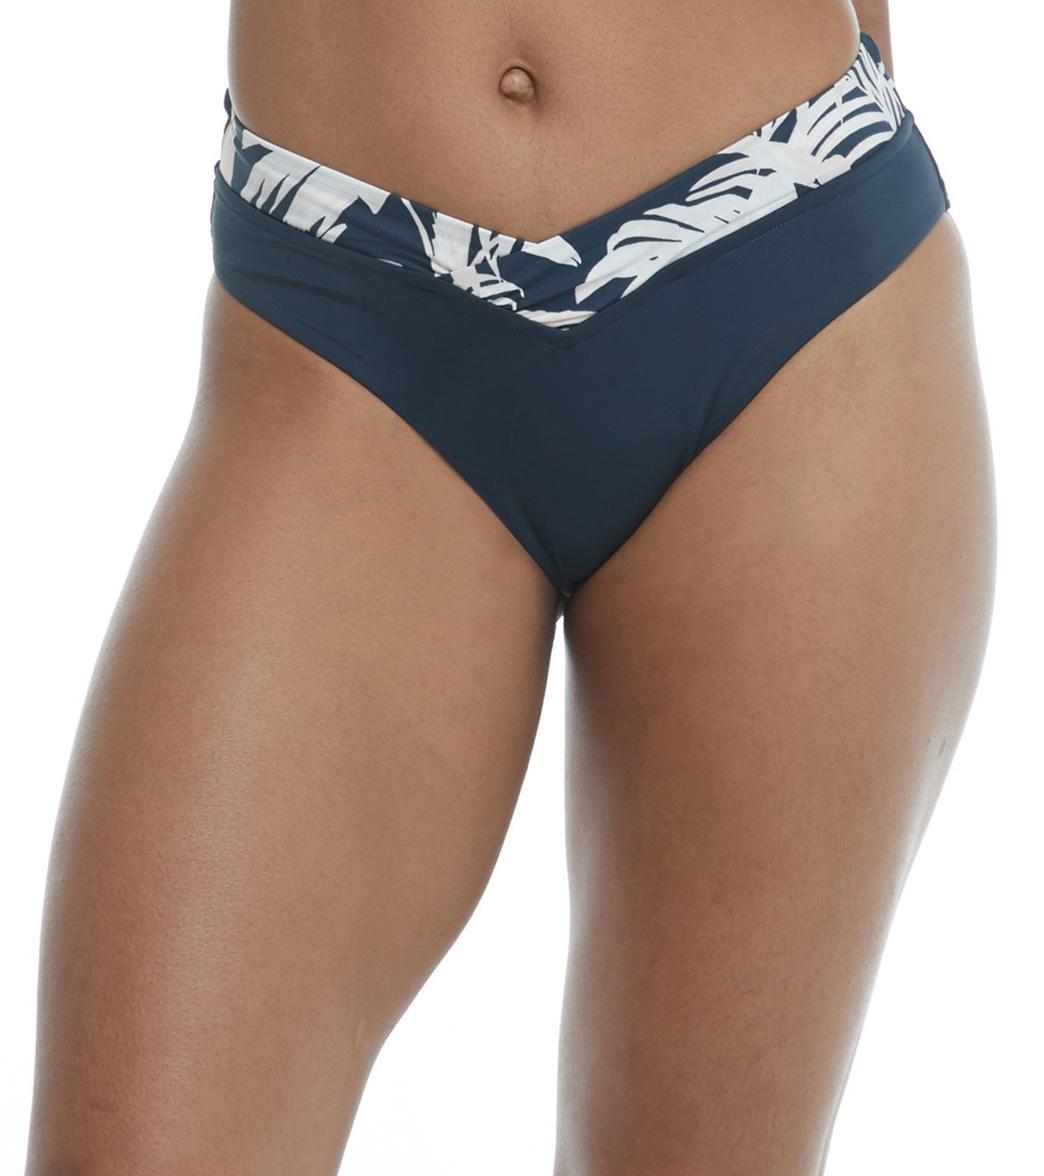 Skye Women's Palm Cove Kennedy High Rise Bikini Bottom